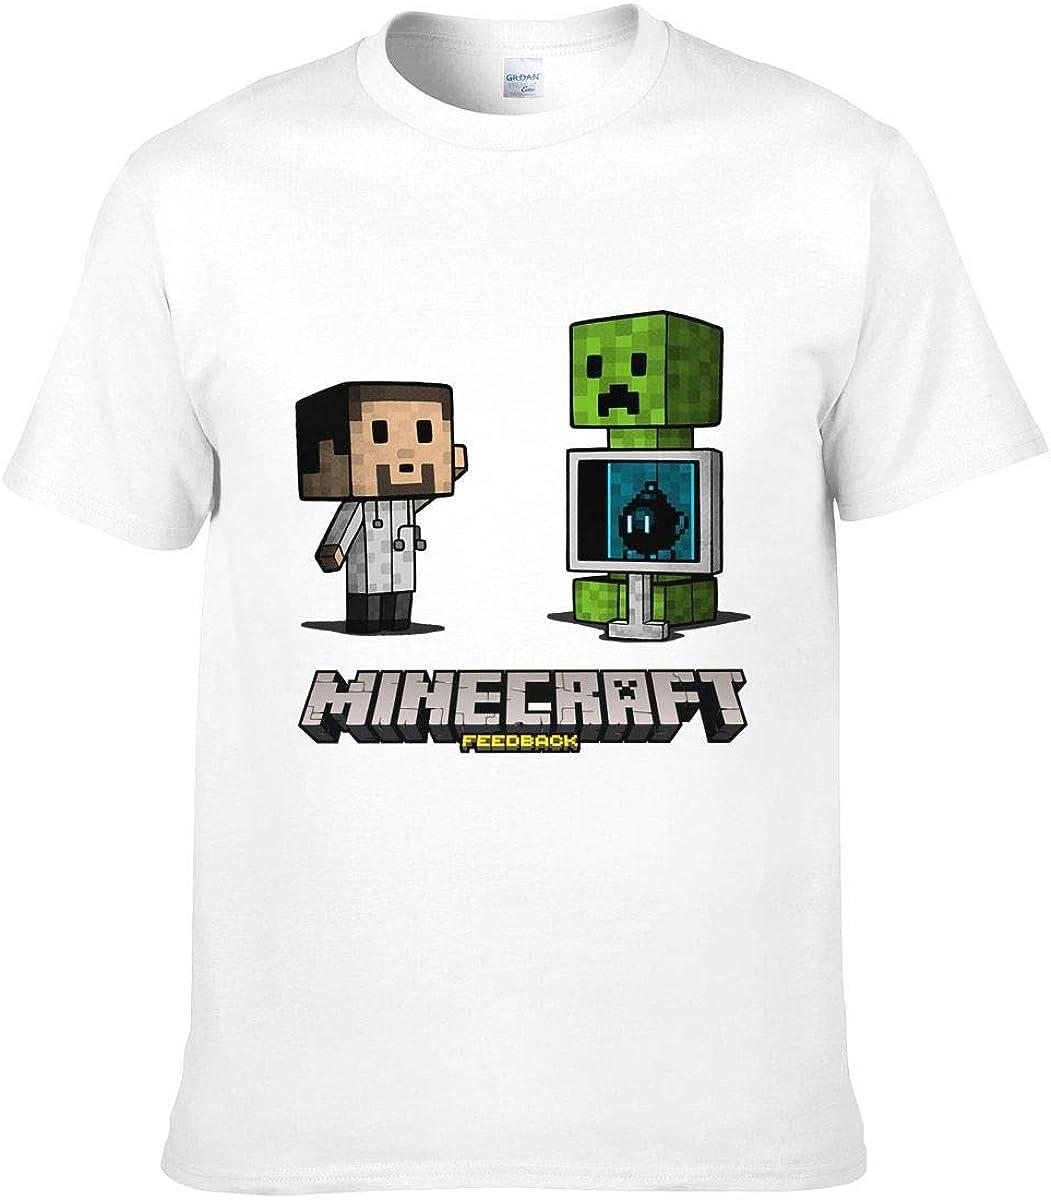 Min-E_CRA-Ft Sand-Box Camiseta de algodón de Manga Corta para ...